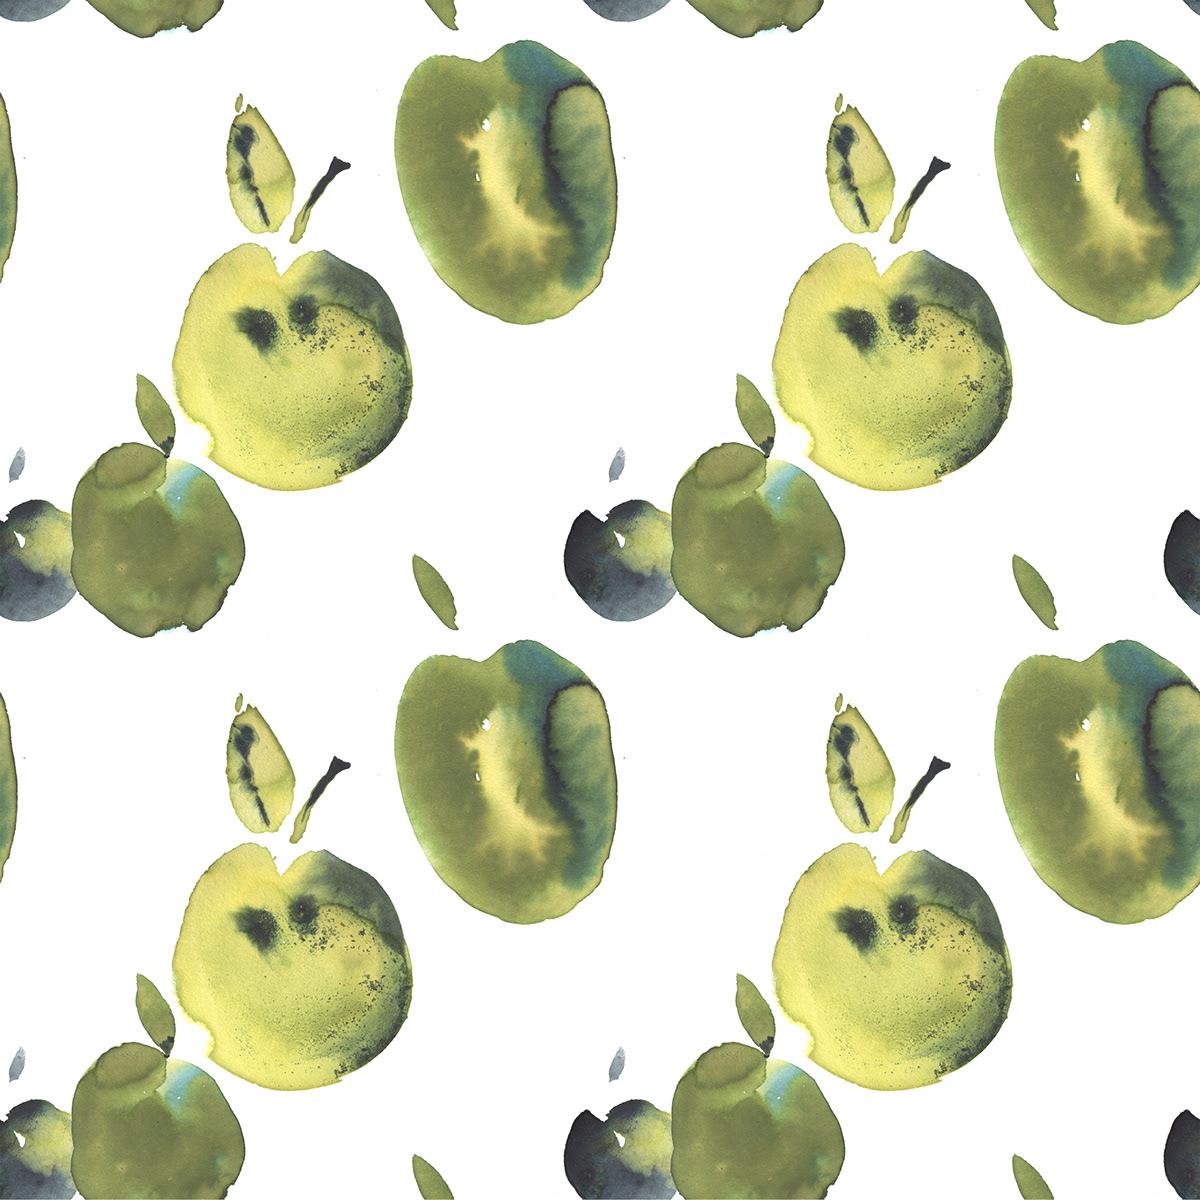 apple design pattern print watercolor акварель графика Иллюстратор